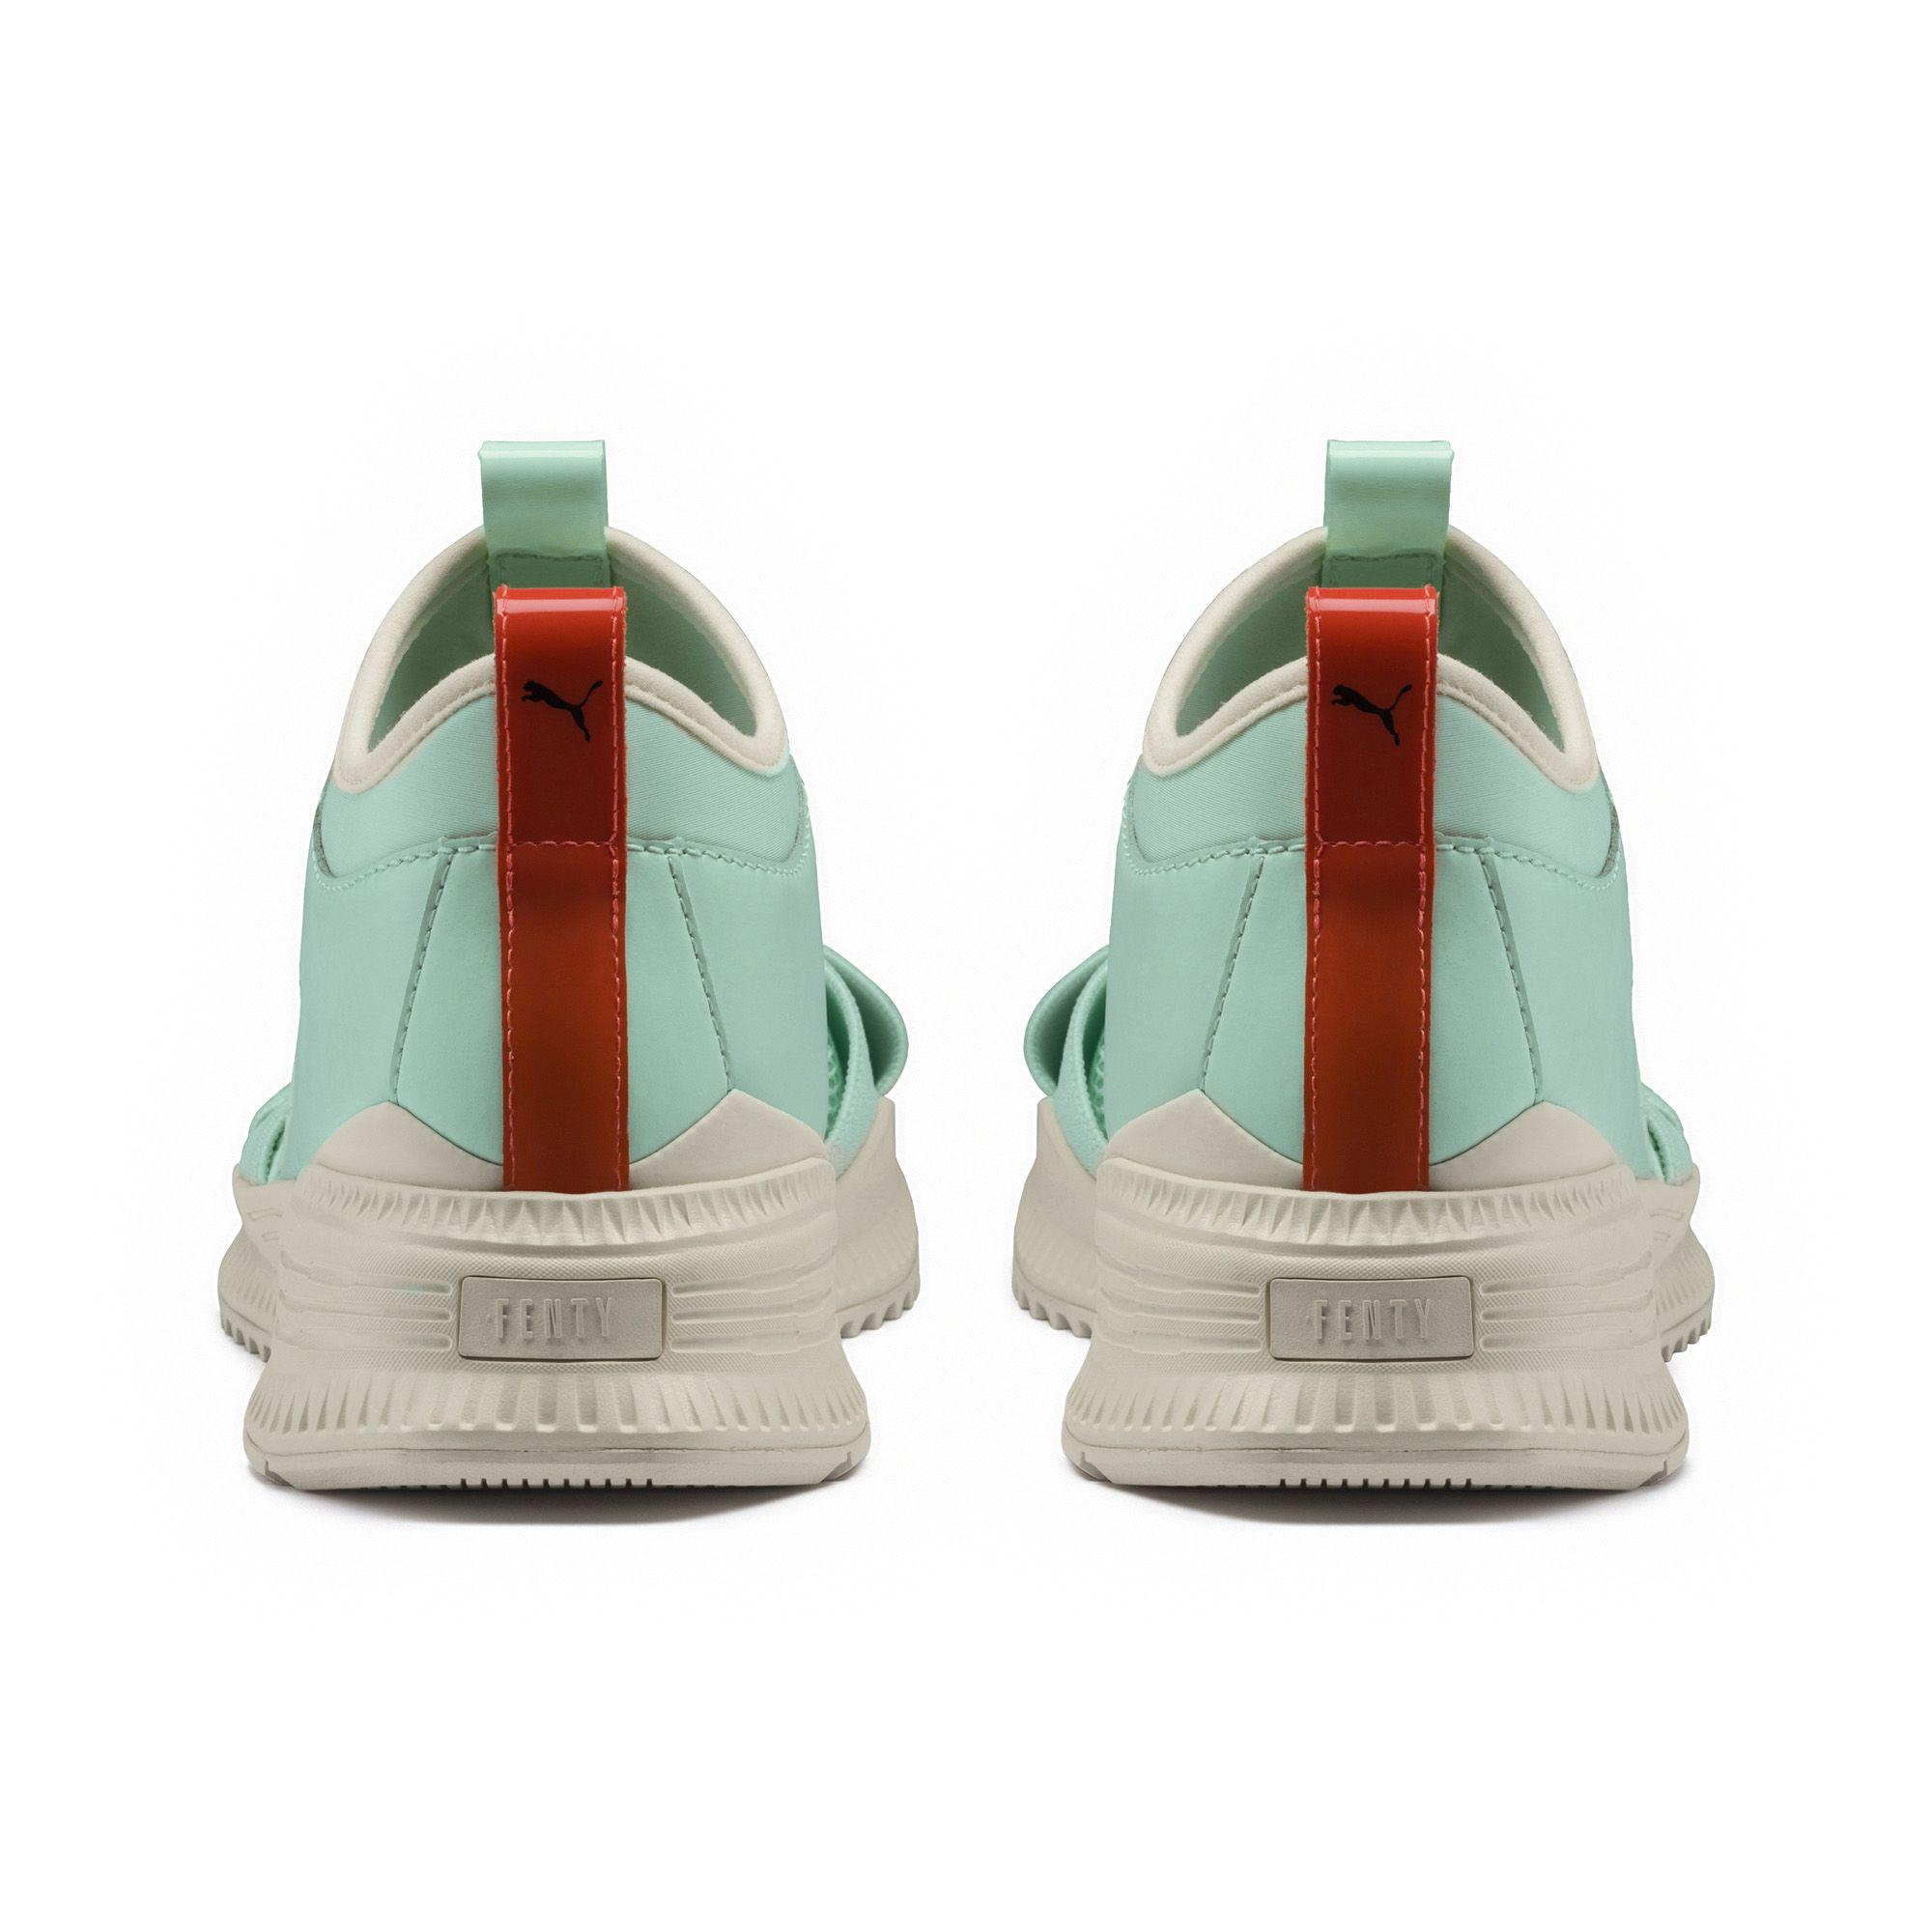 reputable site 24582 b86f6 PUMA Multicolor Fenty Avid Women's Sneakers